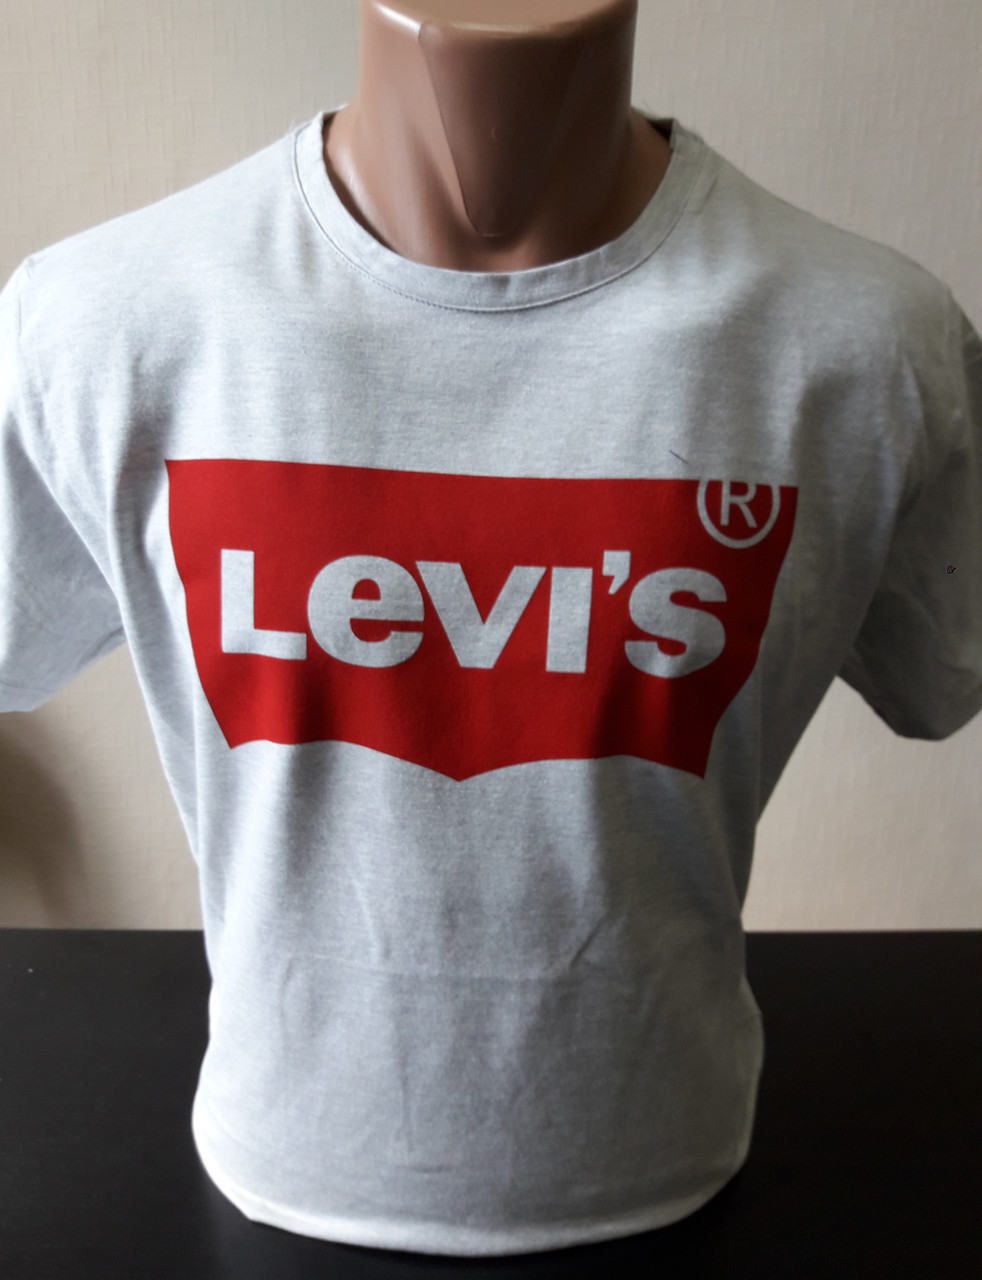 087d85373fb94 Мужская футболка LEVIS (реплика), Турция, цена 180 грн., купить в Киеве —  Prom.ua (ID#943054305)